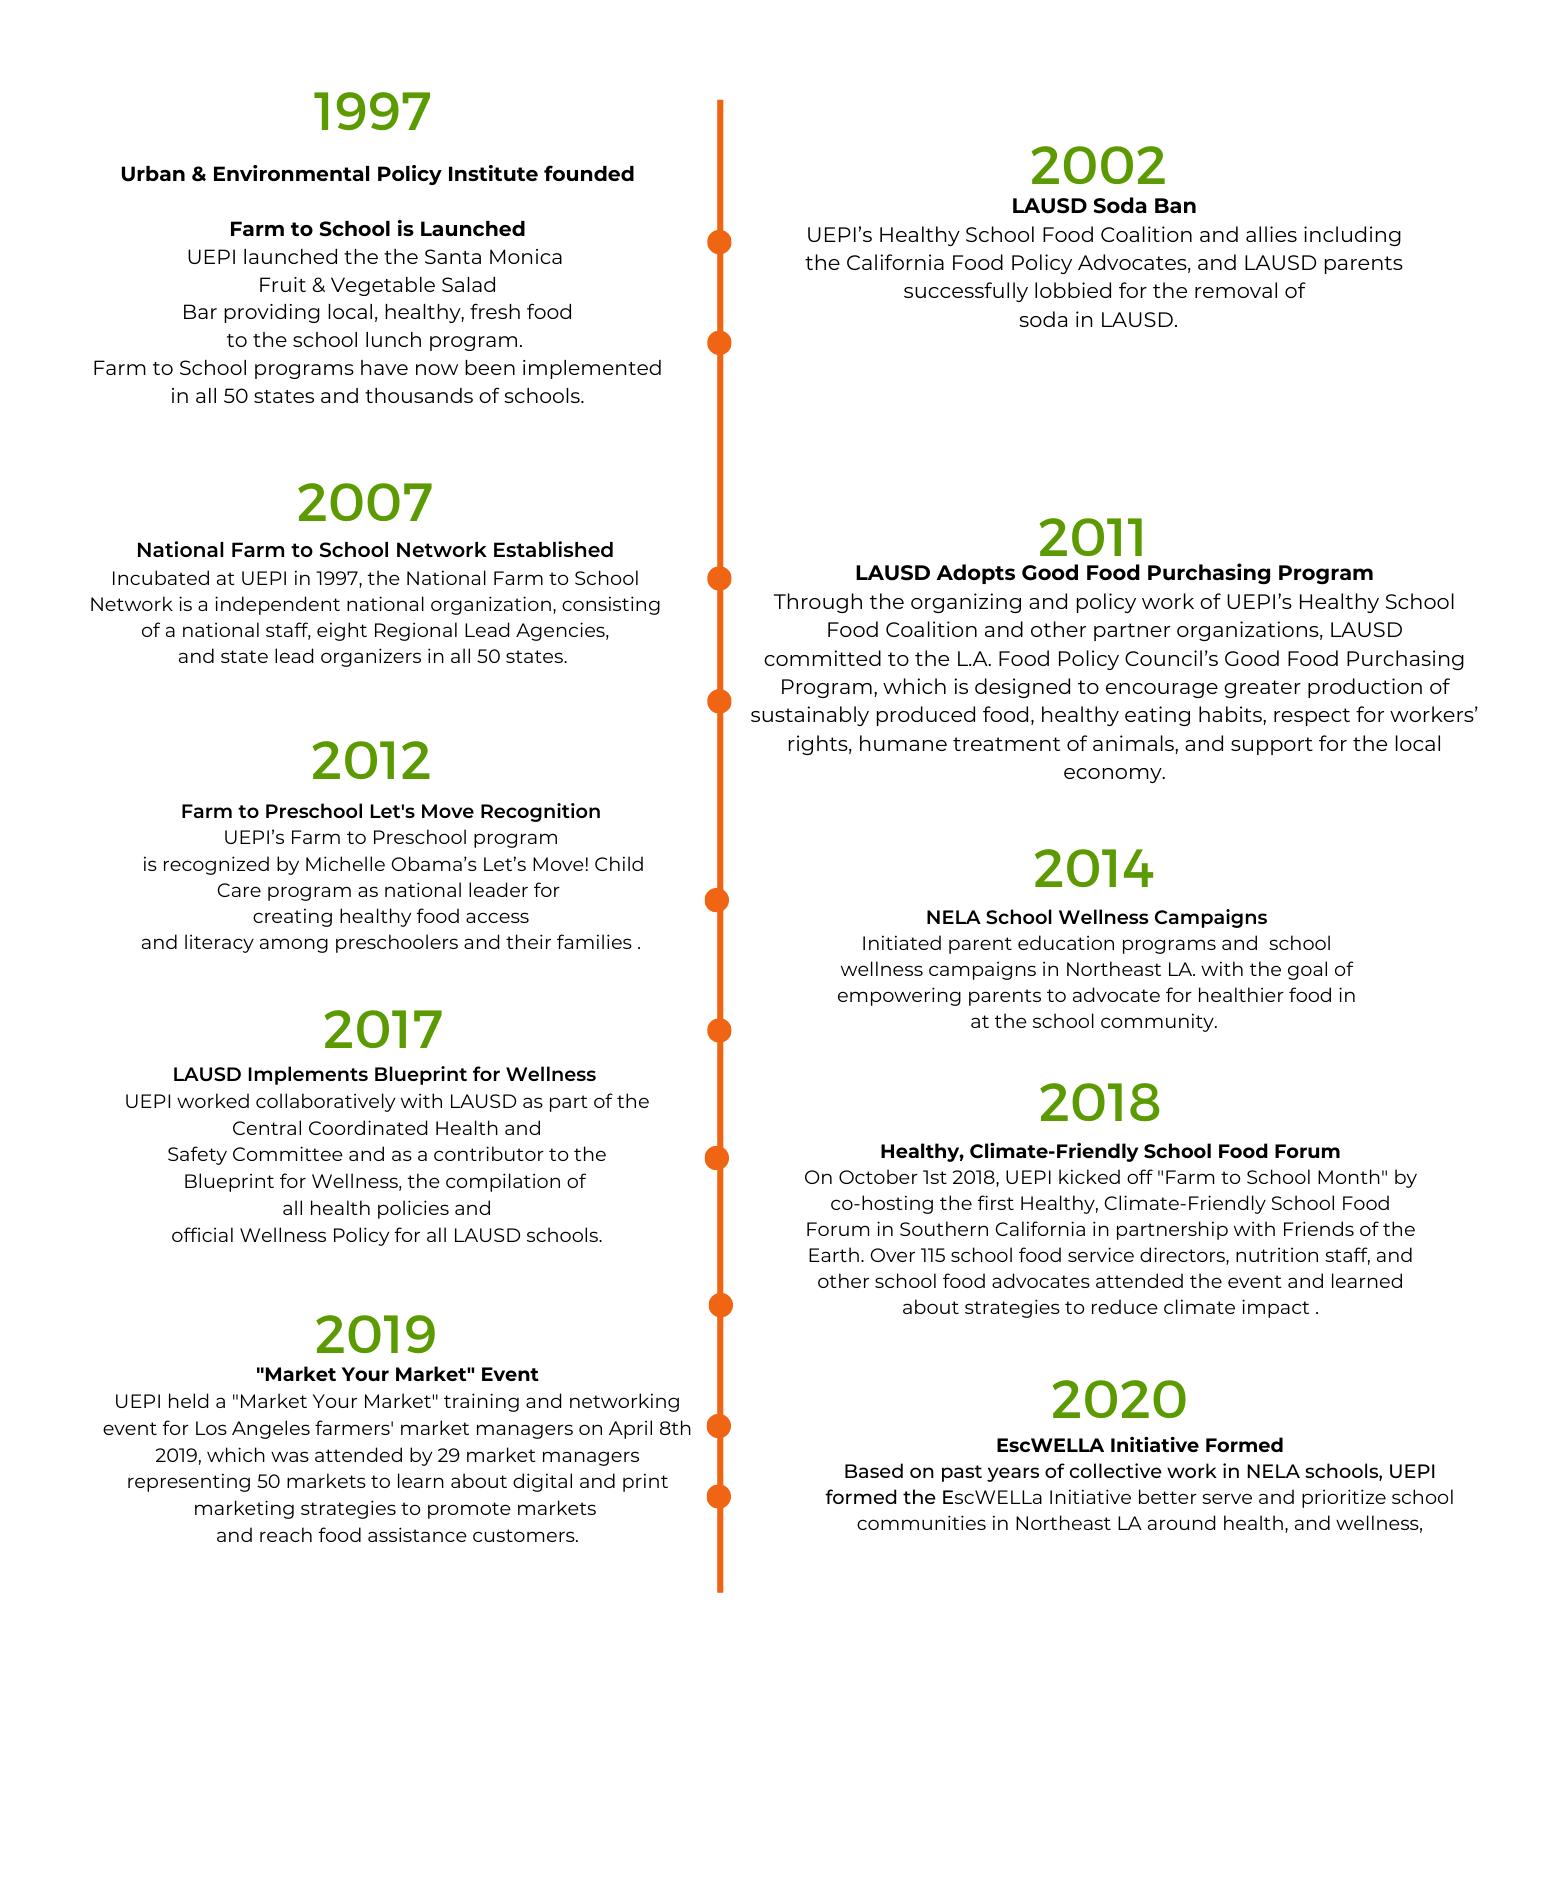 Food Programs 2020 + EscWELLa Concept